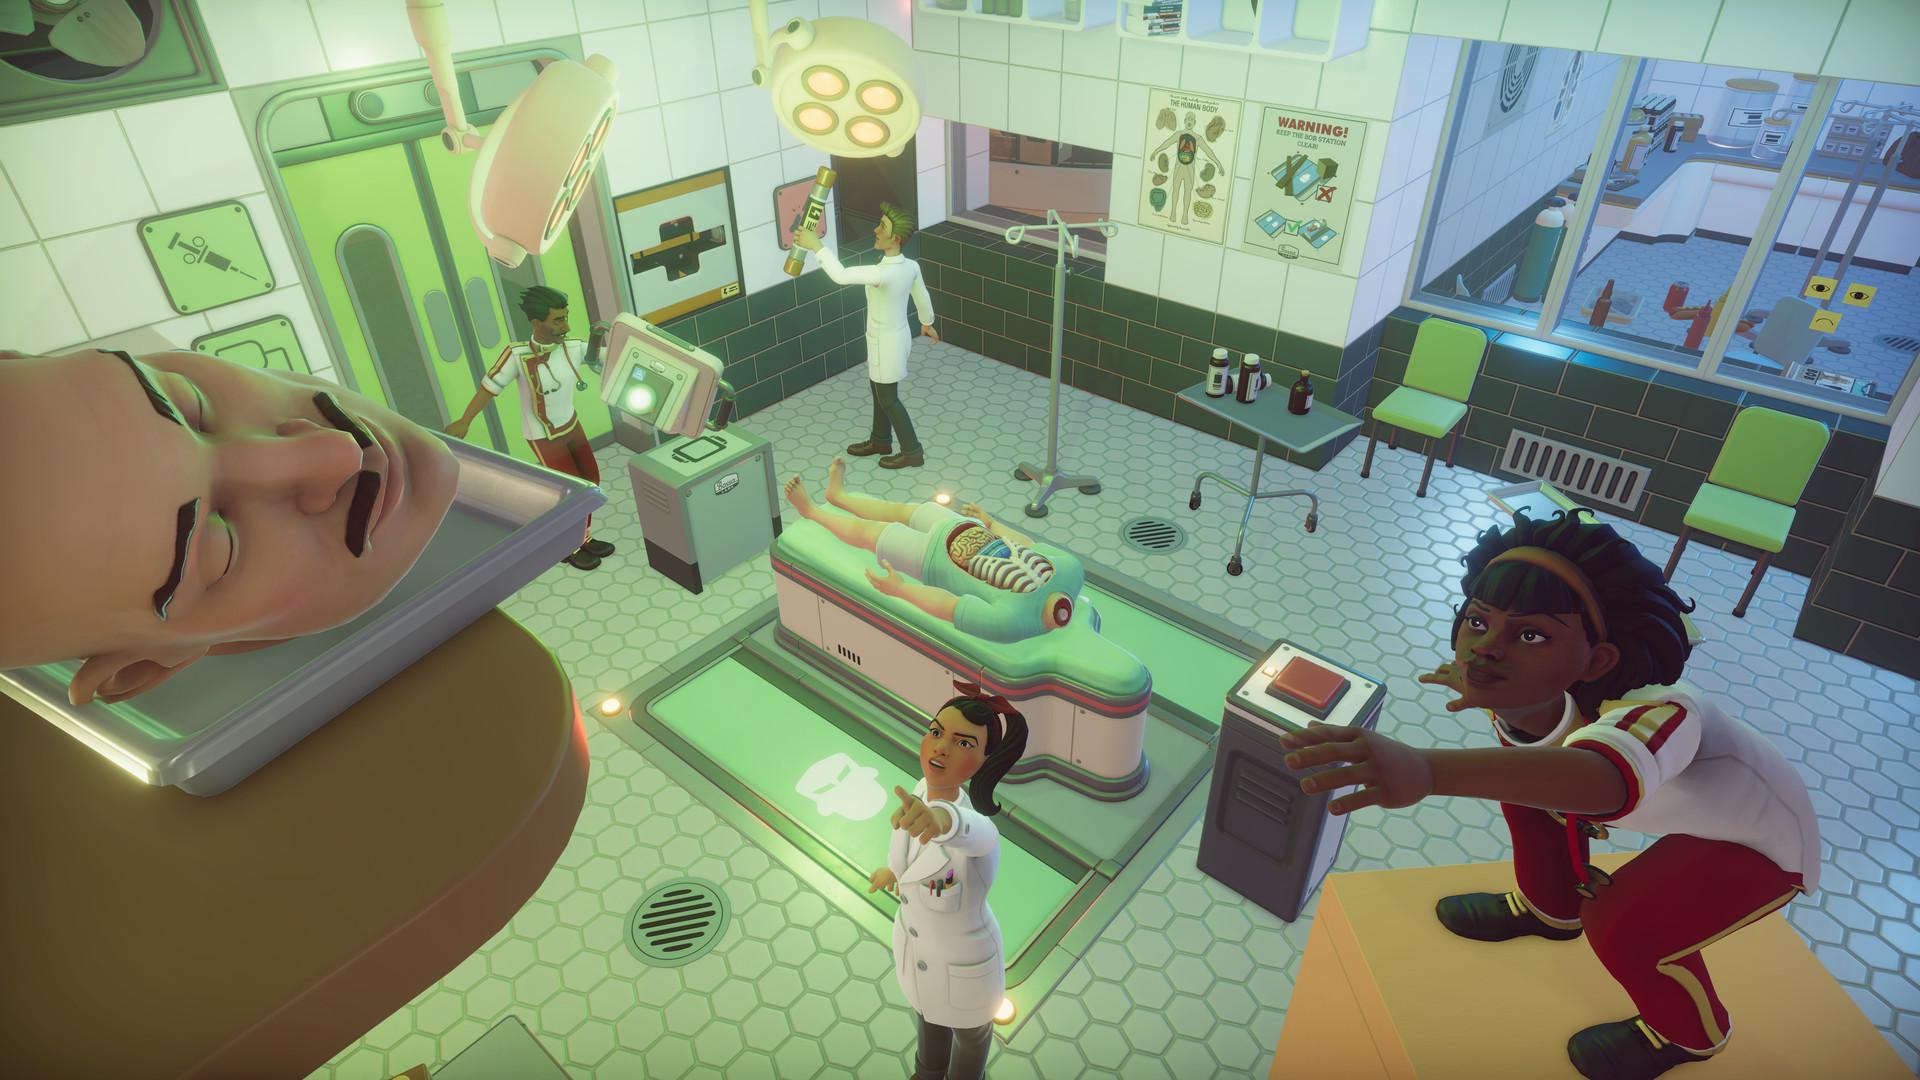 Surgeon Simulator 2 Free Download